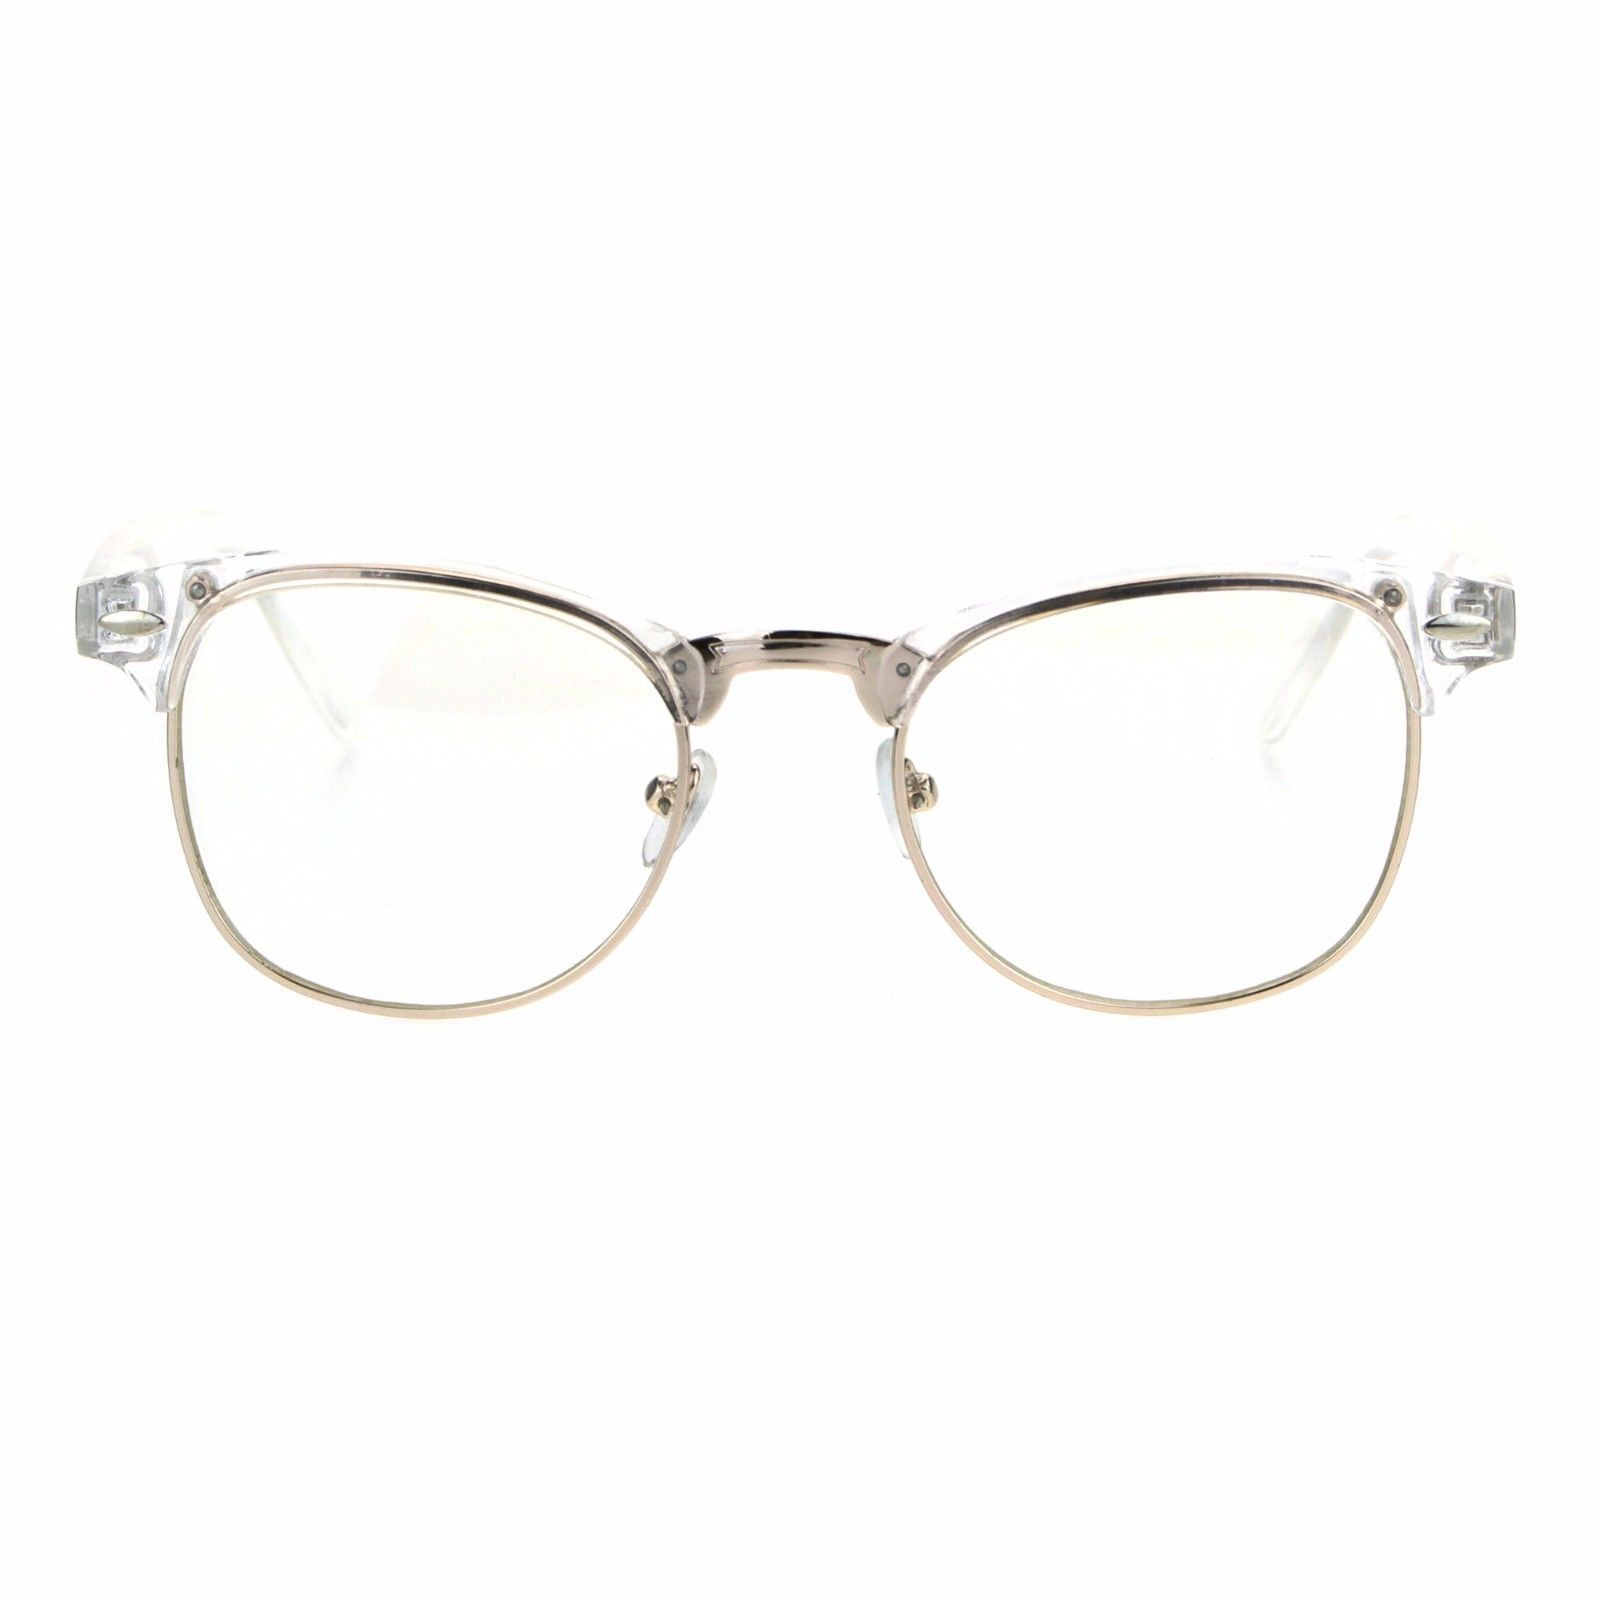 Clear Lens Clear Gold Frame Glasses Designer Style Eyeglasses Unisex